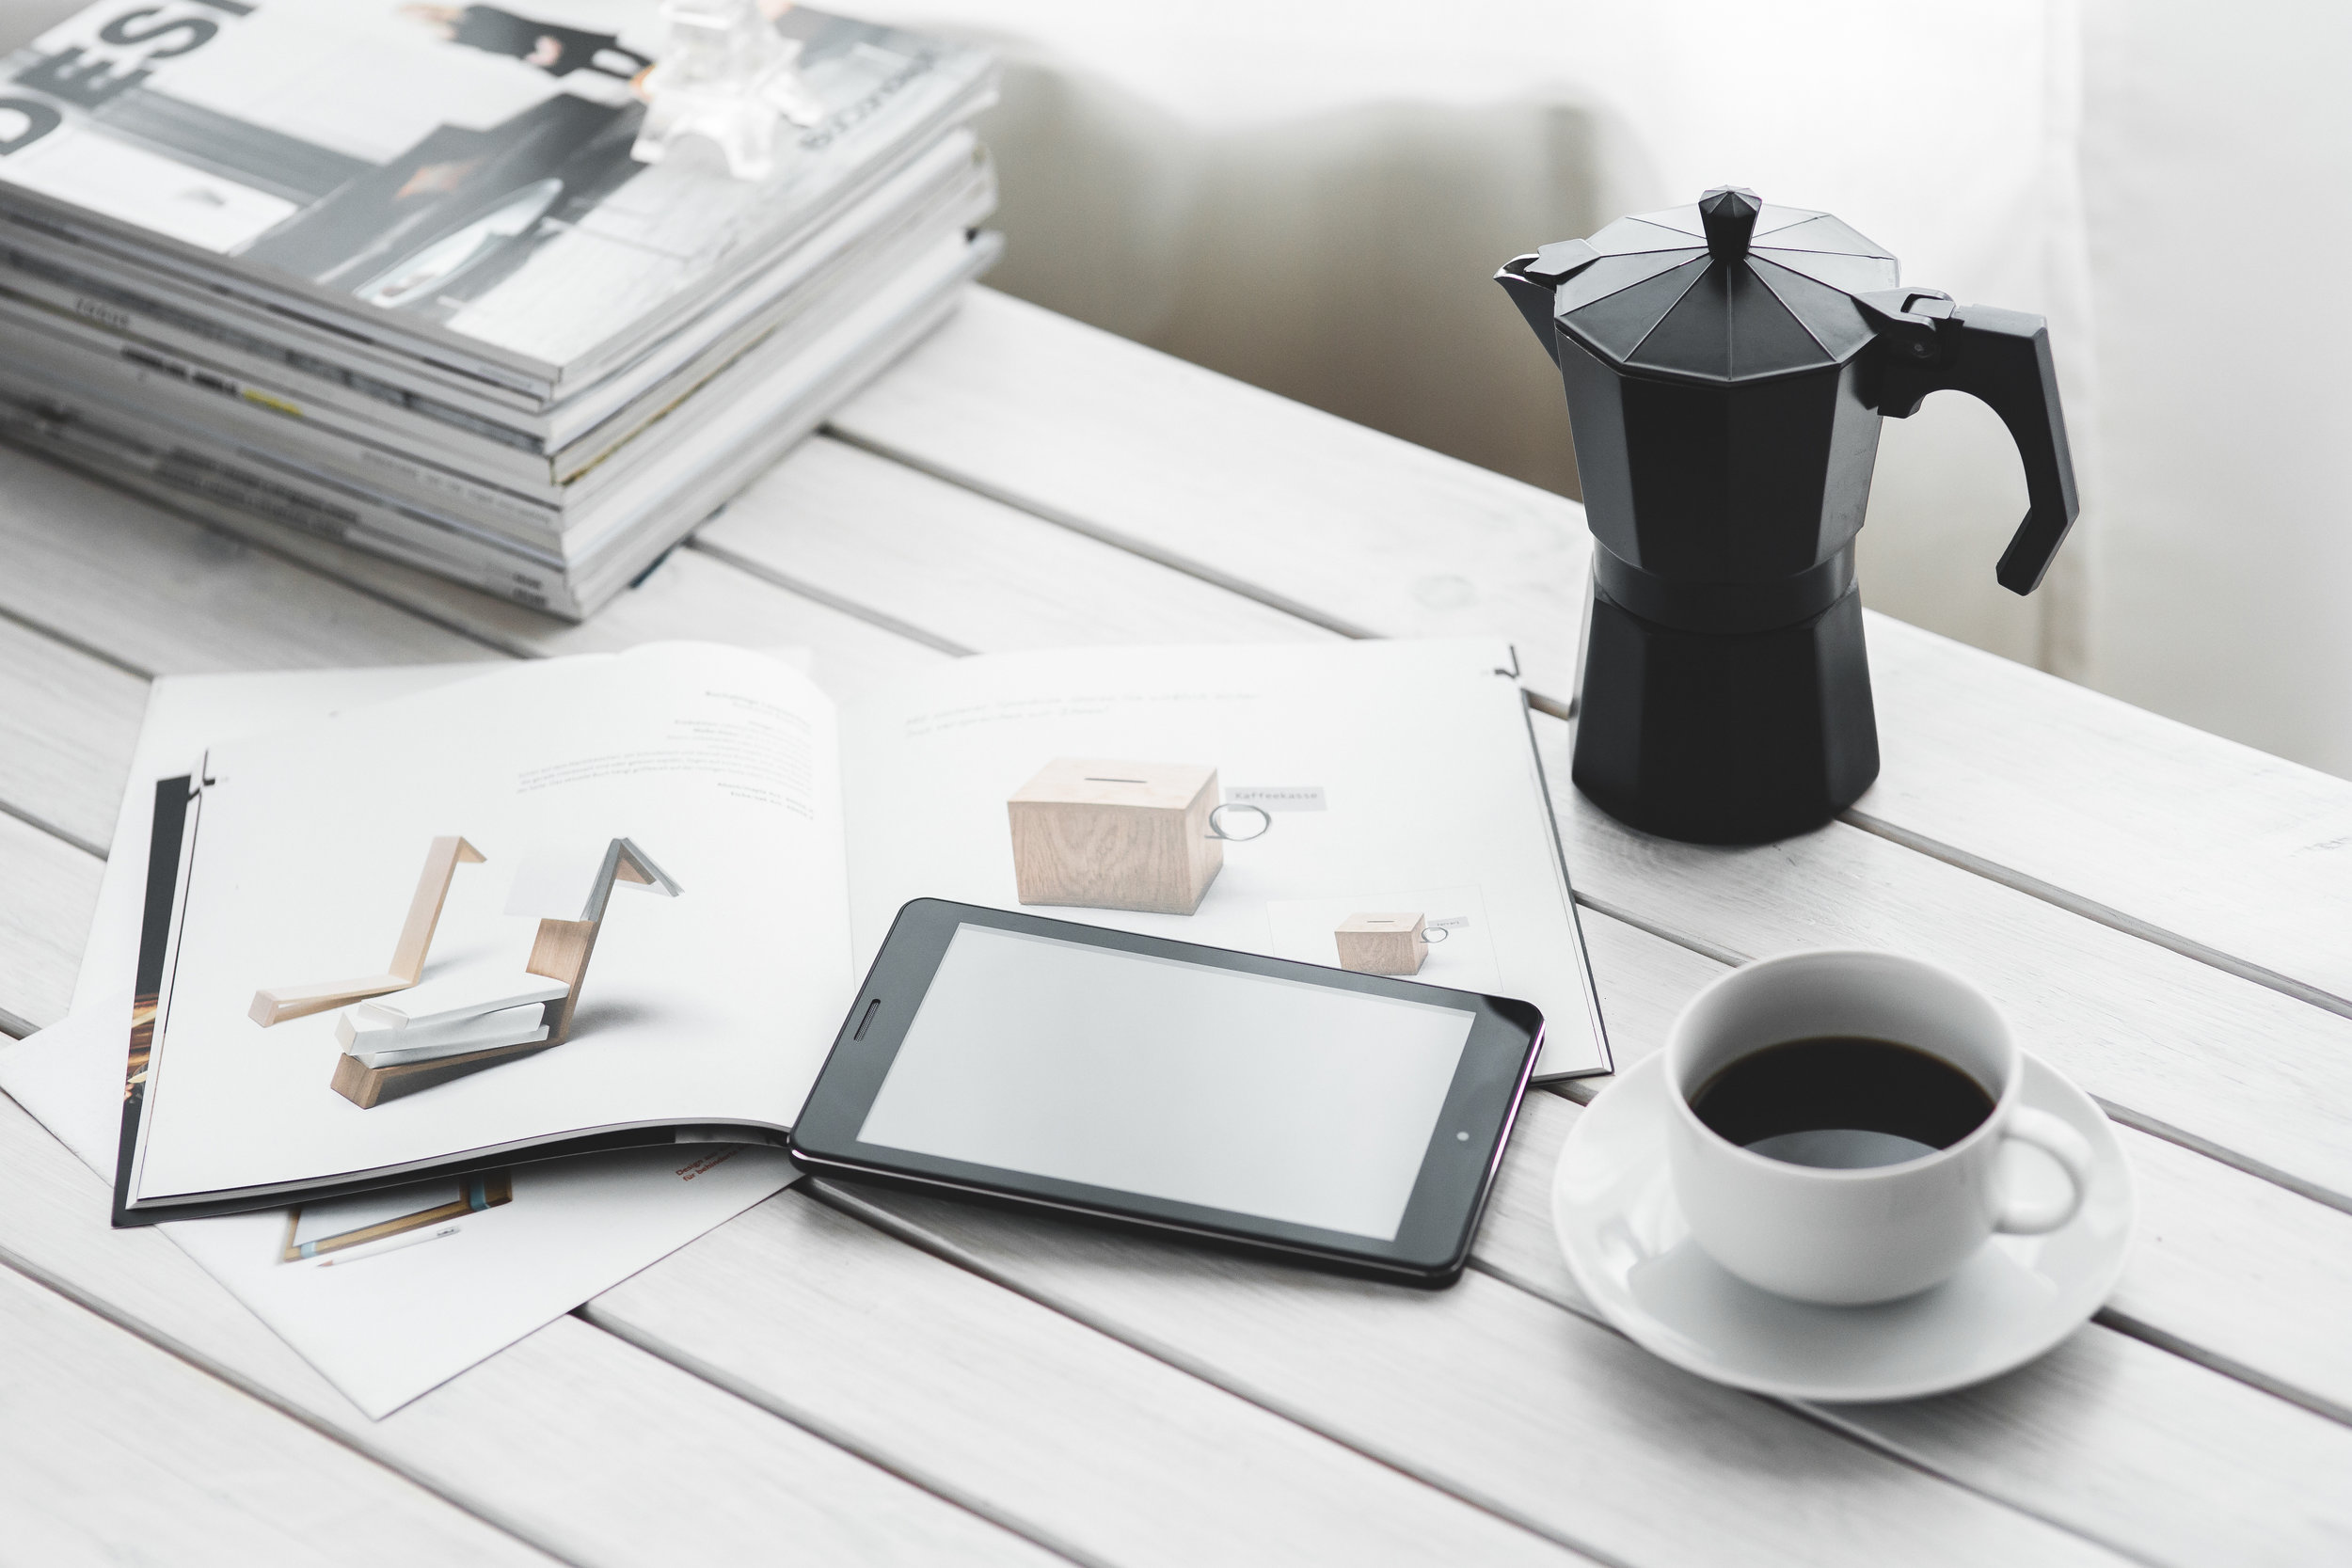 coffee-cup-magazines-desk-6350.jpg